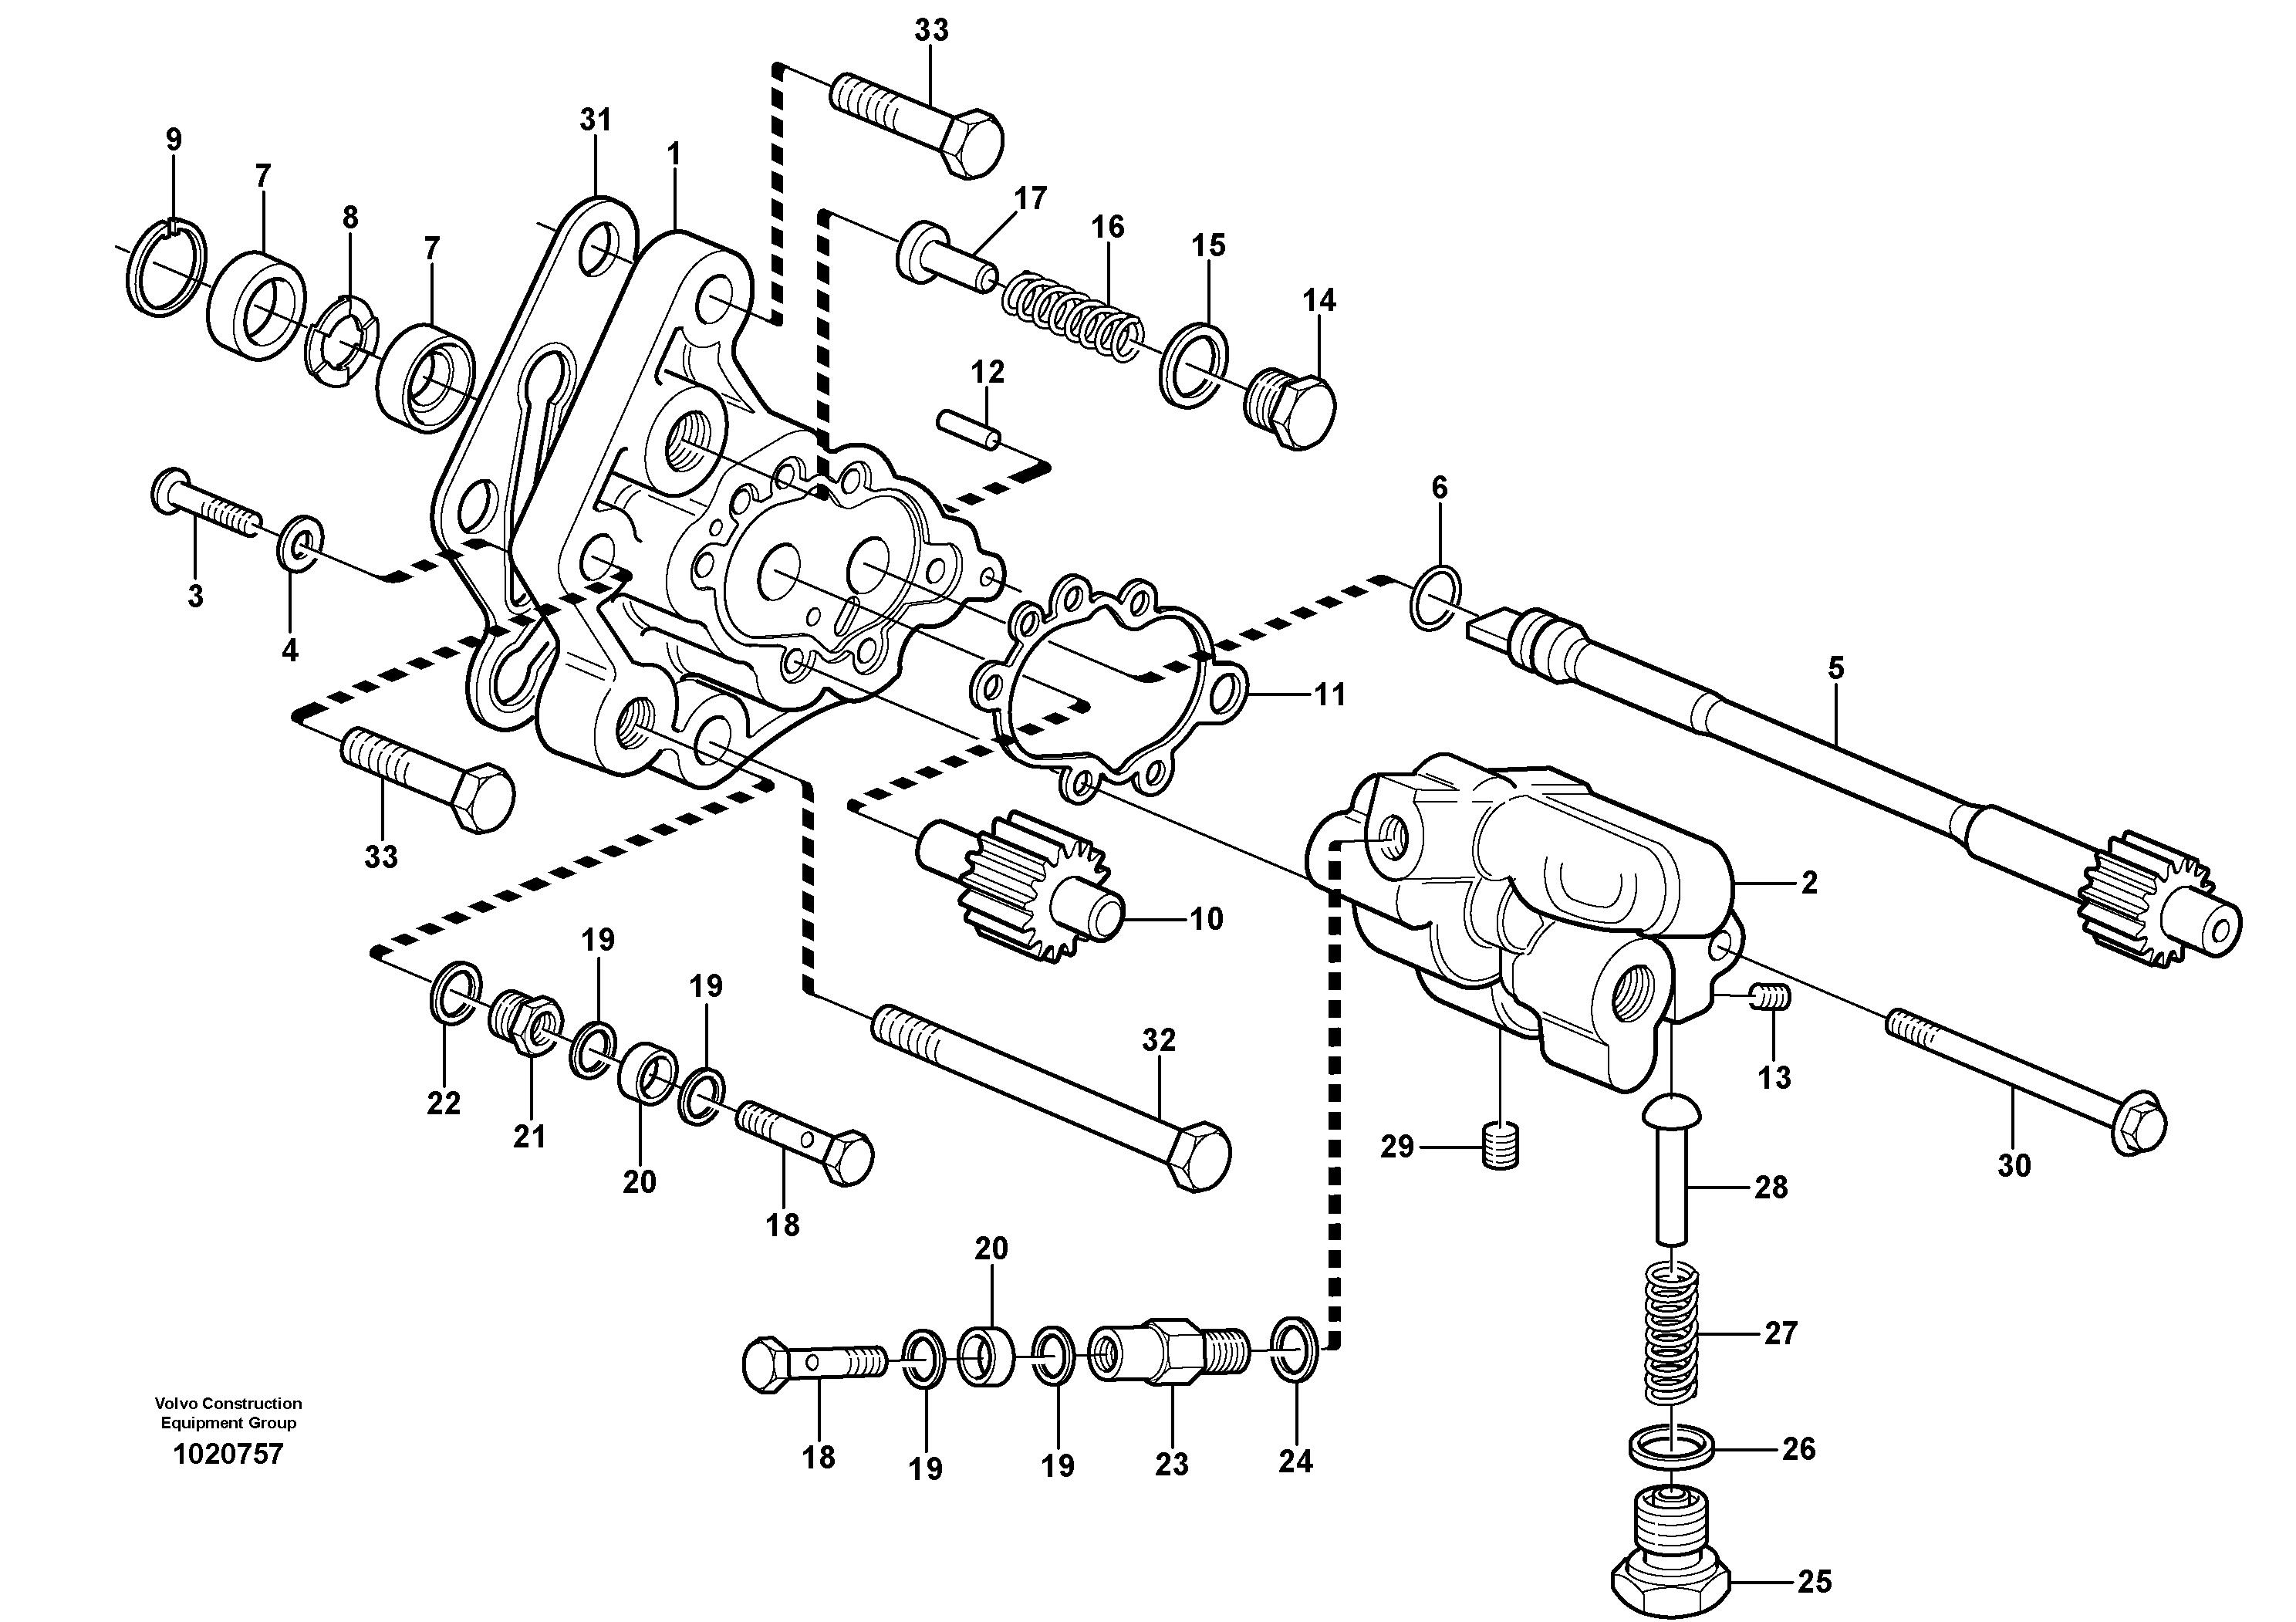 ekskavator-mazot-pompasi